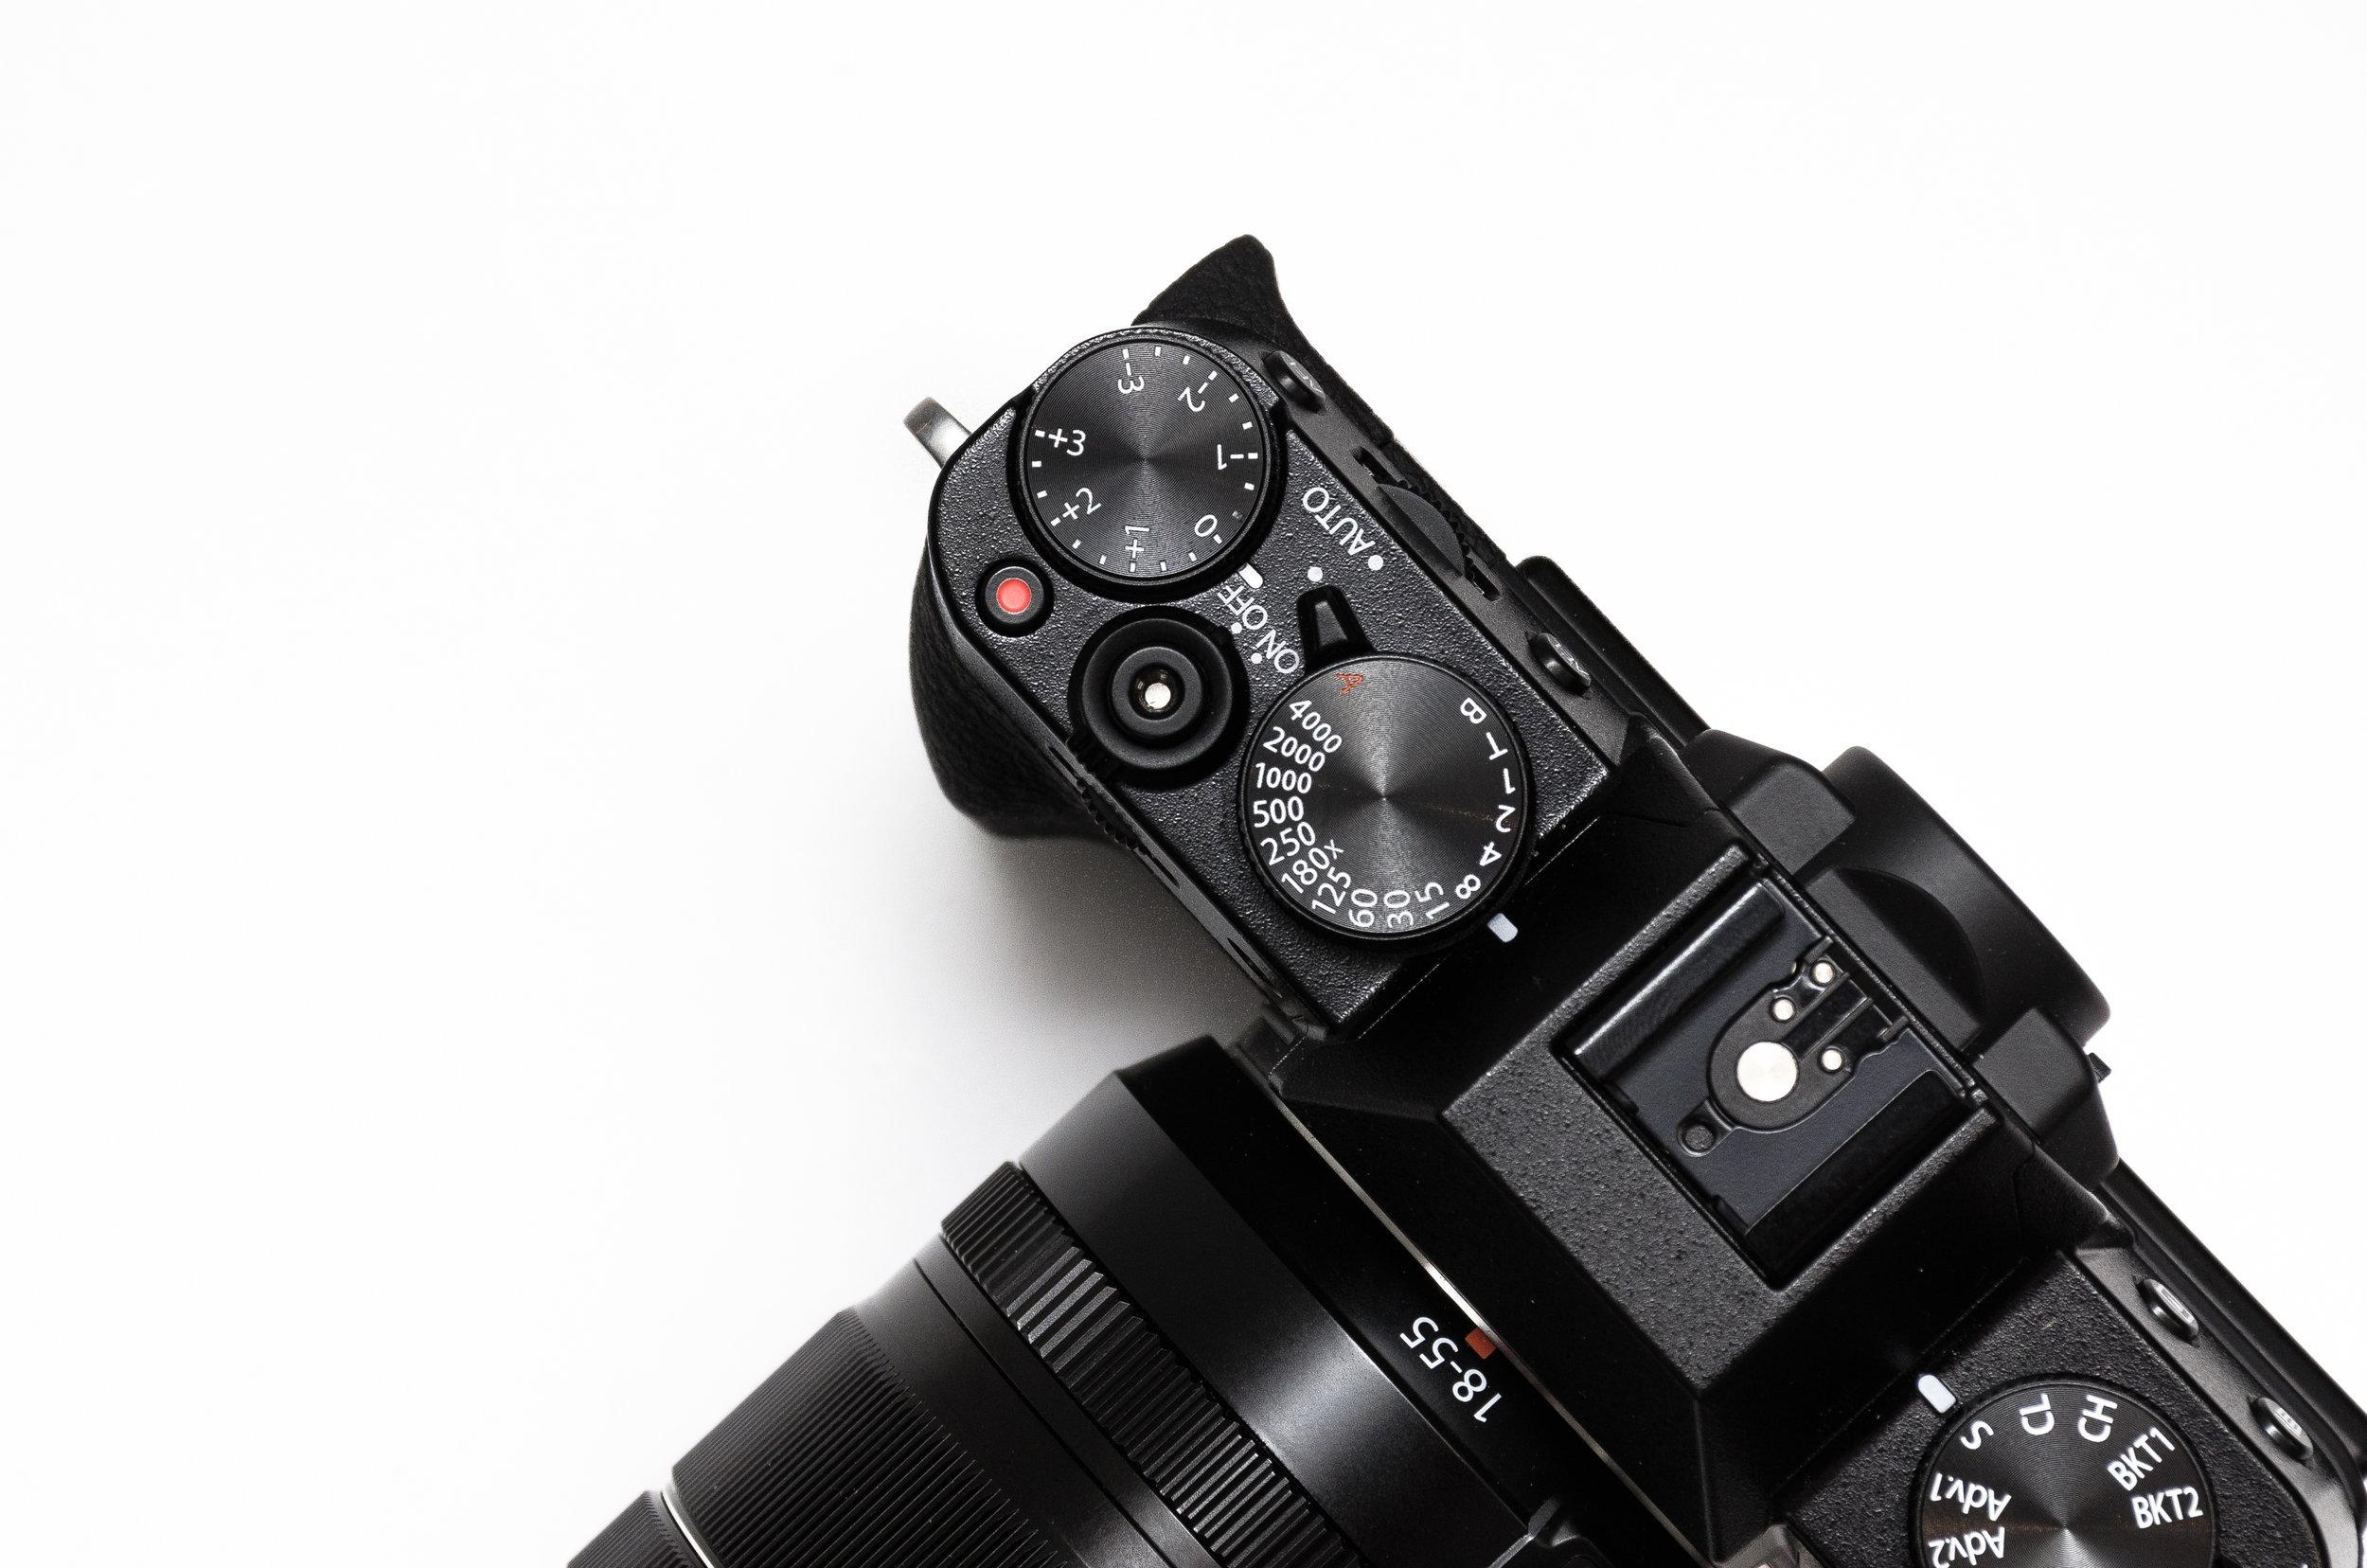 We use a Sony AX-53 4K Camcorder & Panasonic Lumix DMC-G7